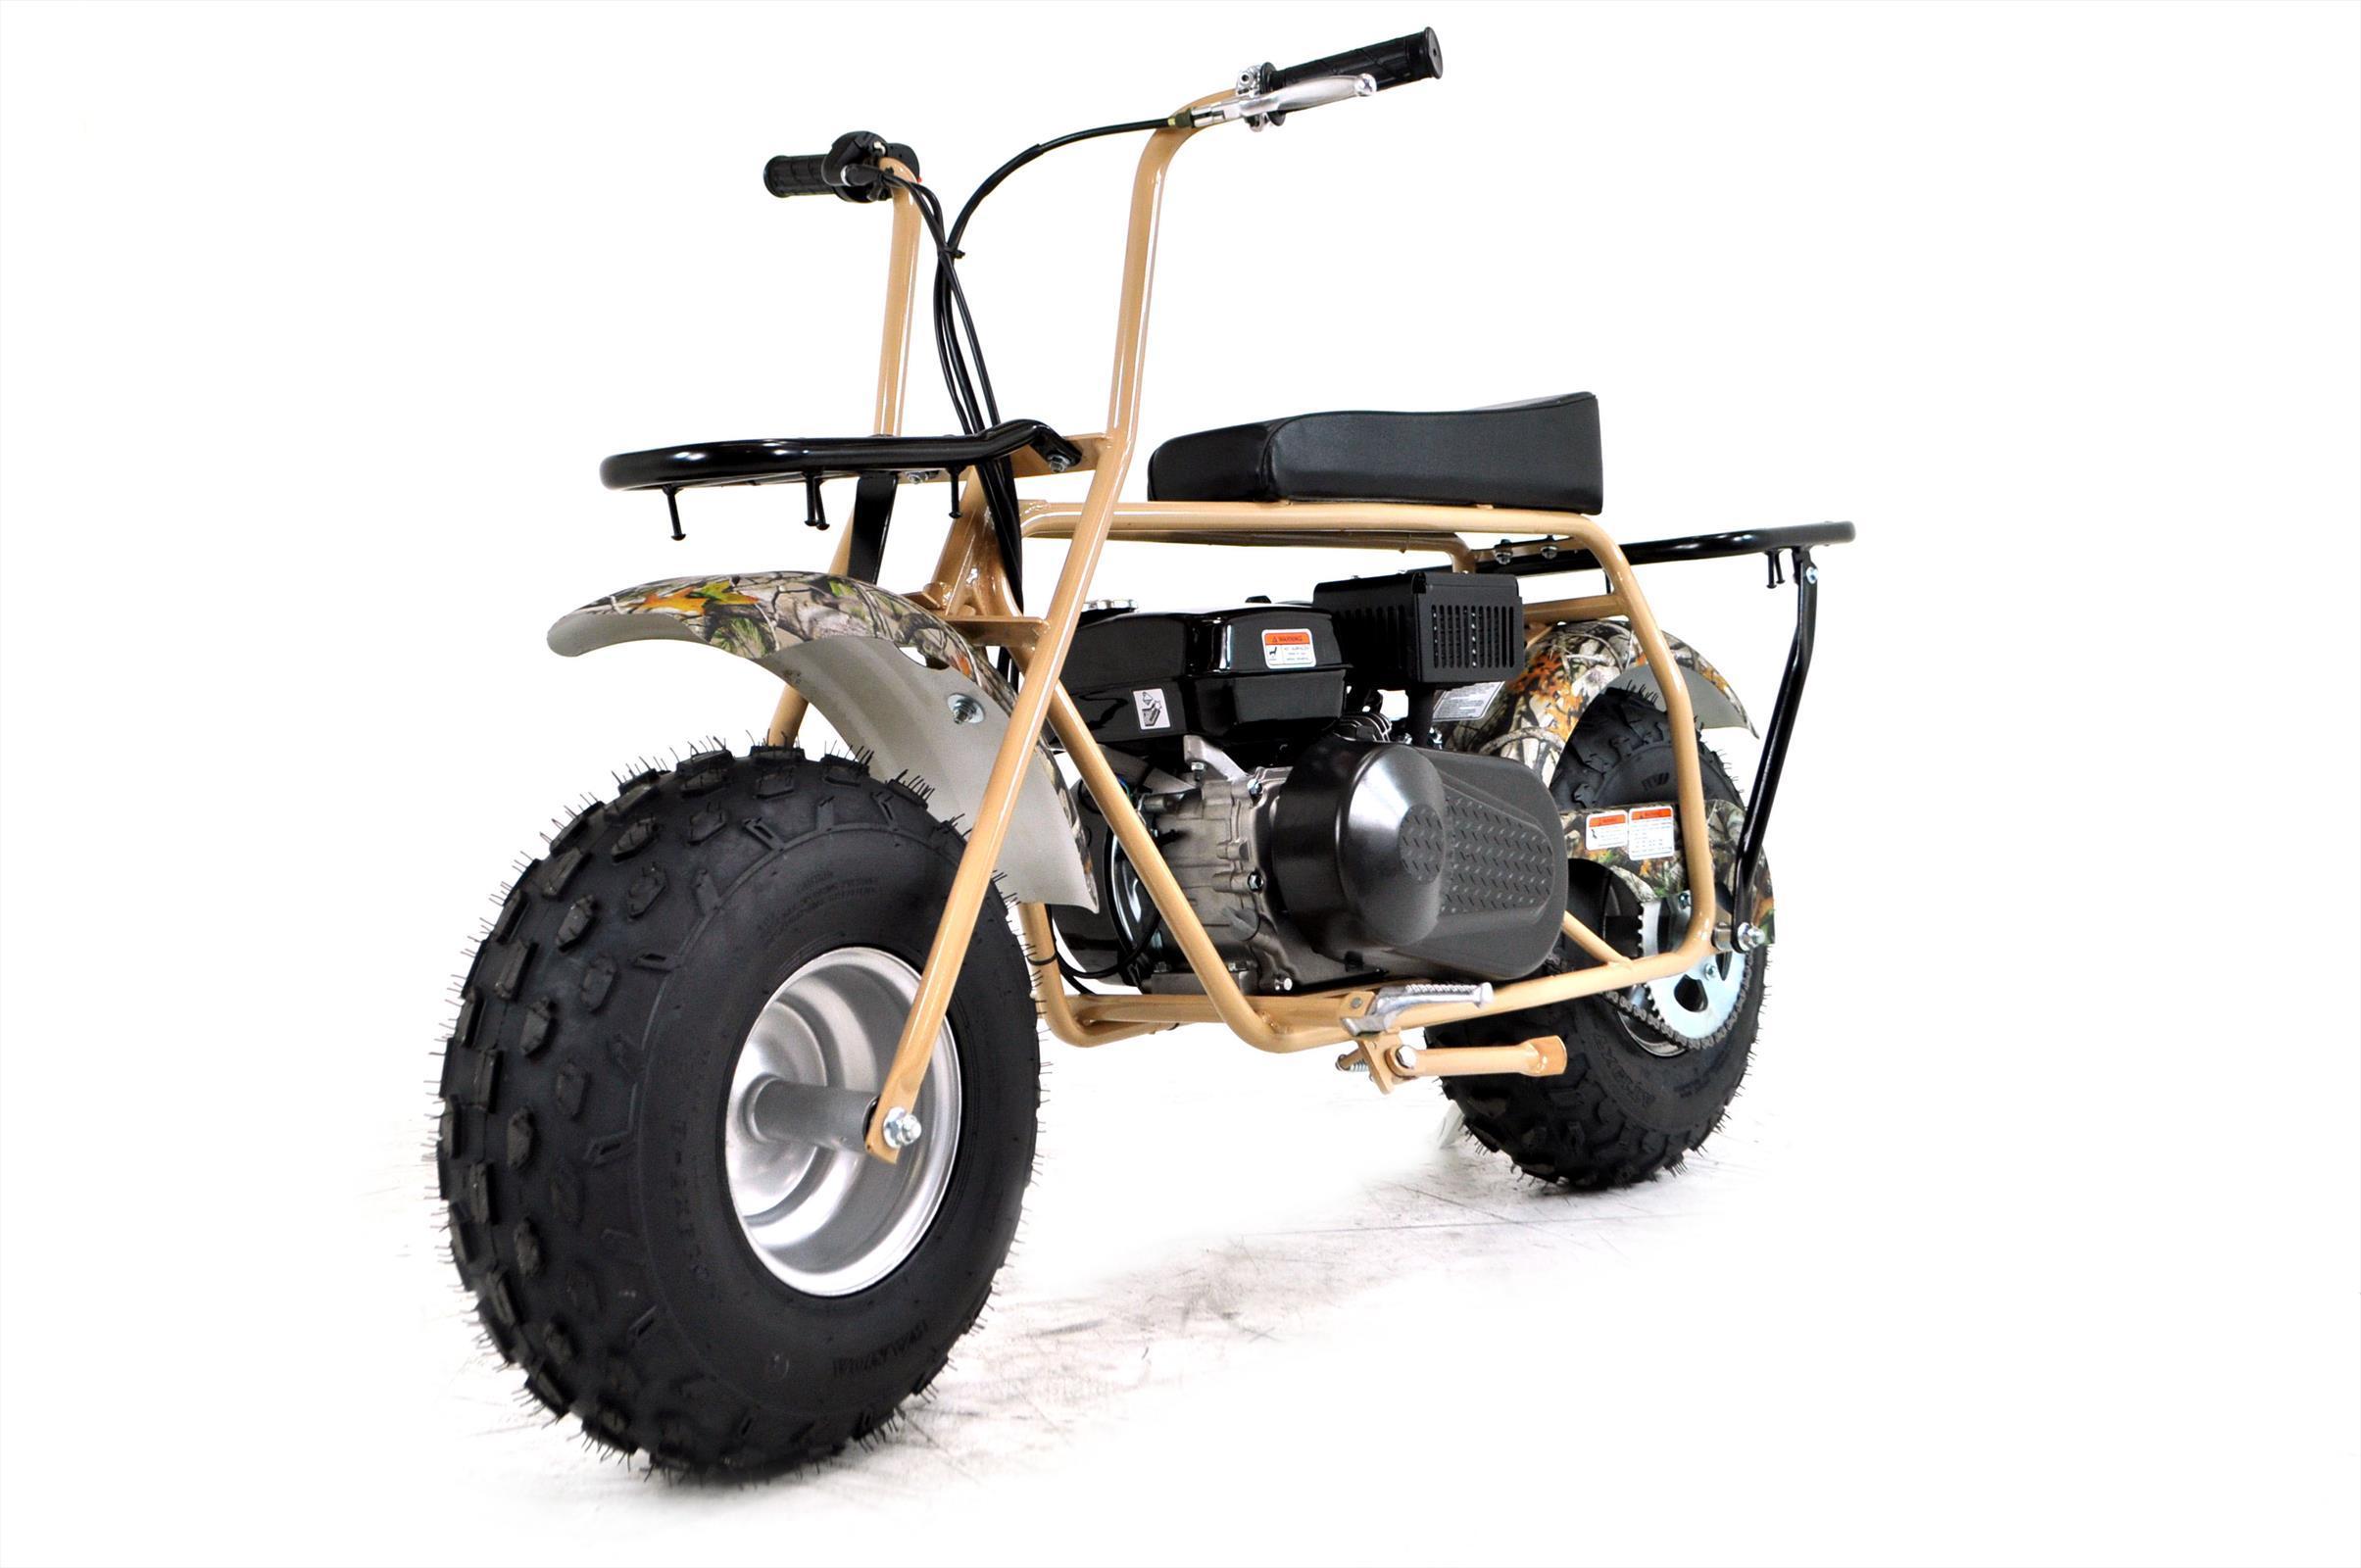 37 Baja Warrior 200 Cc Minibike Price 45000 In